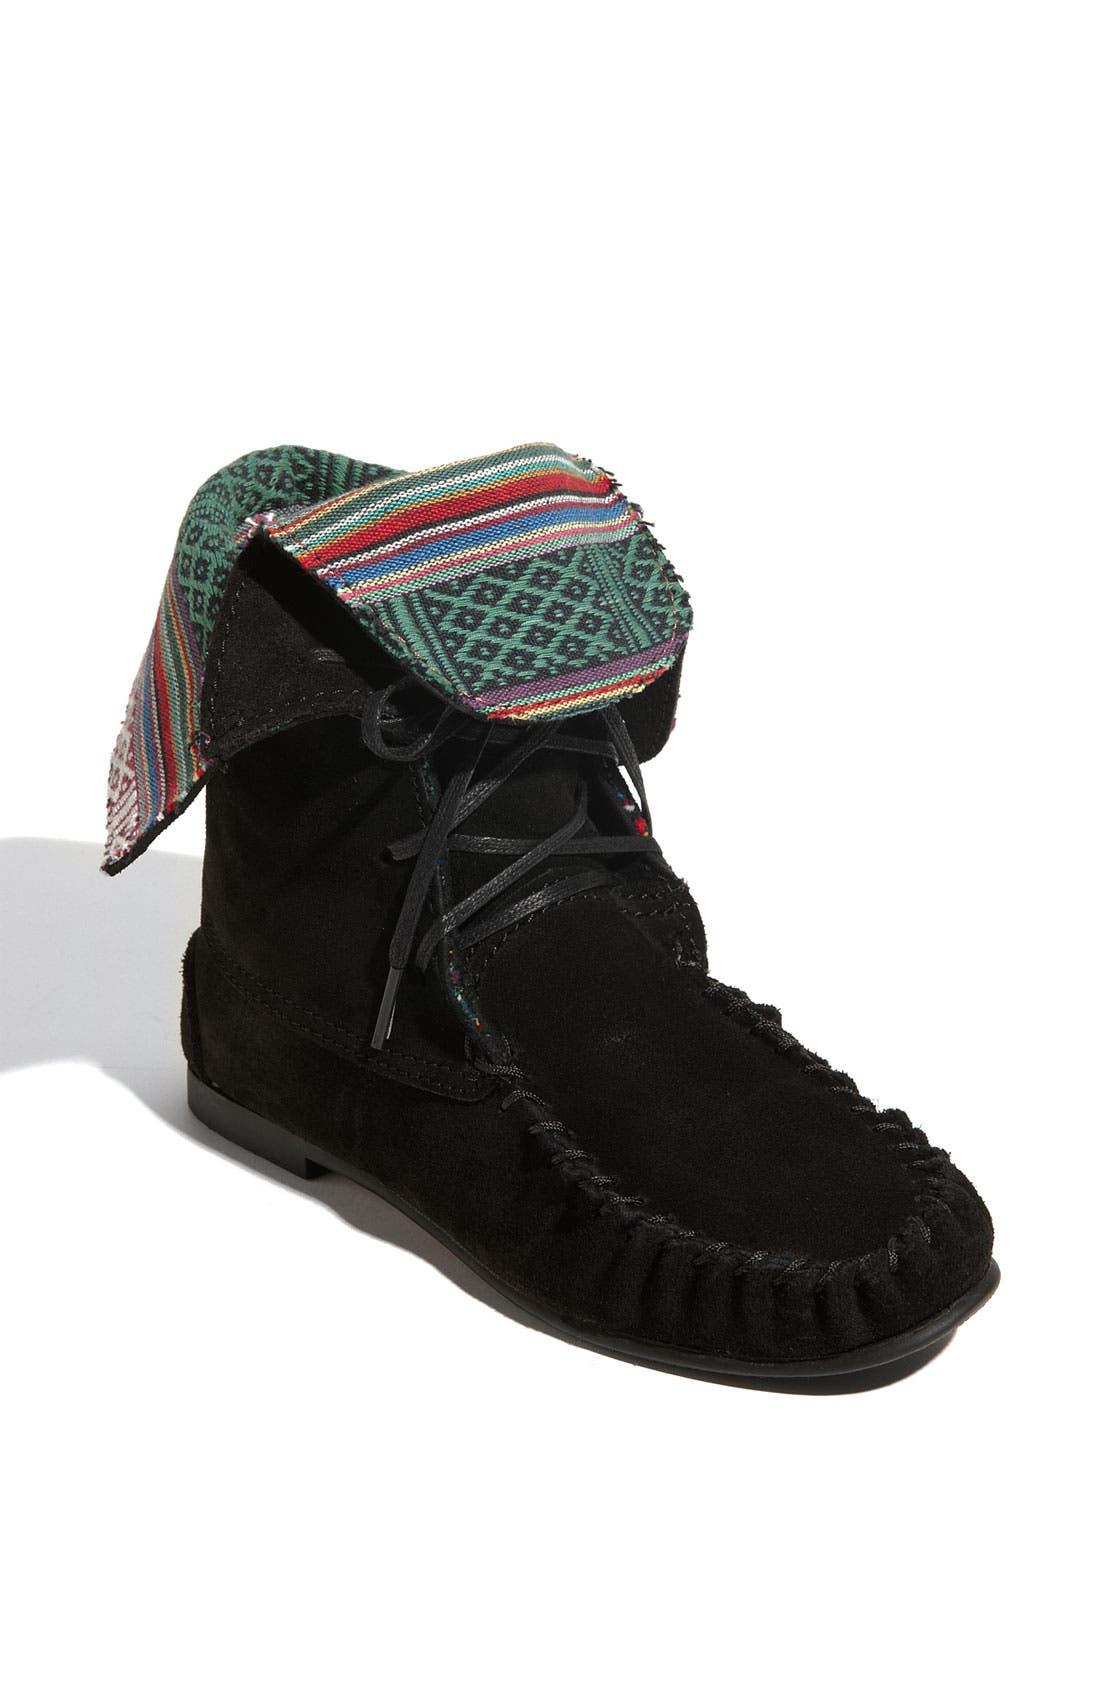 STEVE MADDEN 'Tblanket' Moc Boot, Main, color, 015